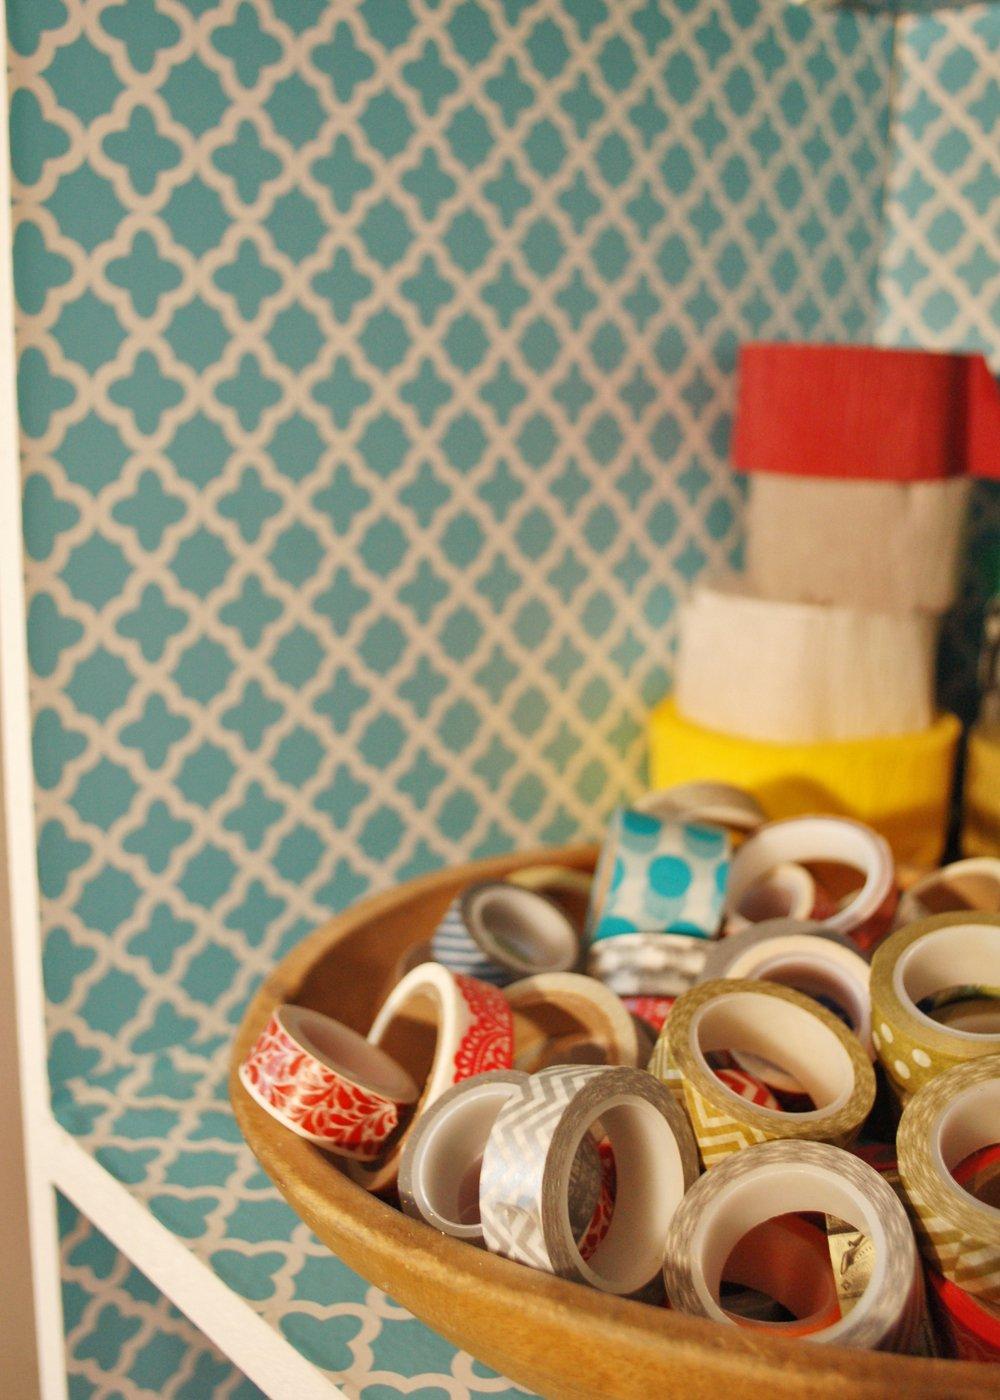 washi tape in bowl on bookshelf